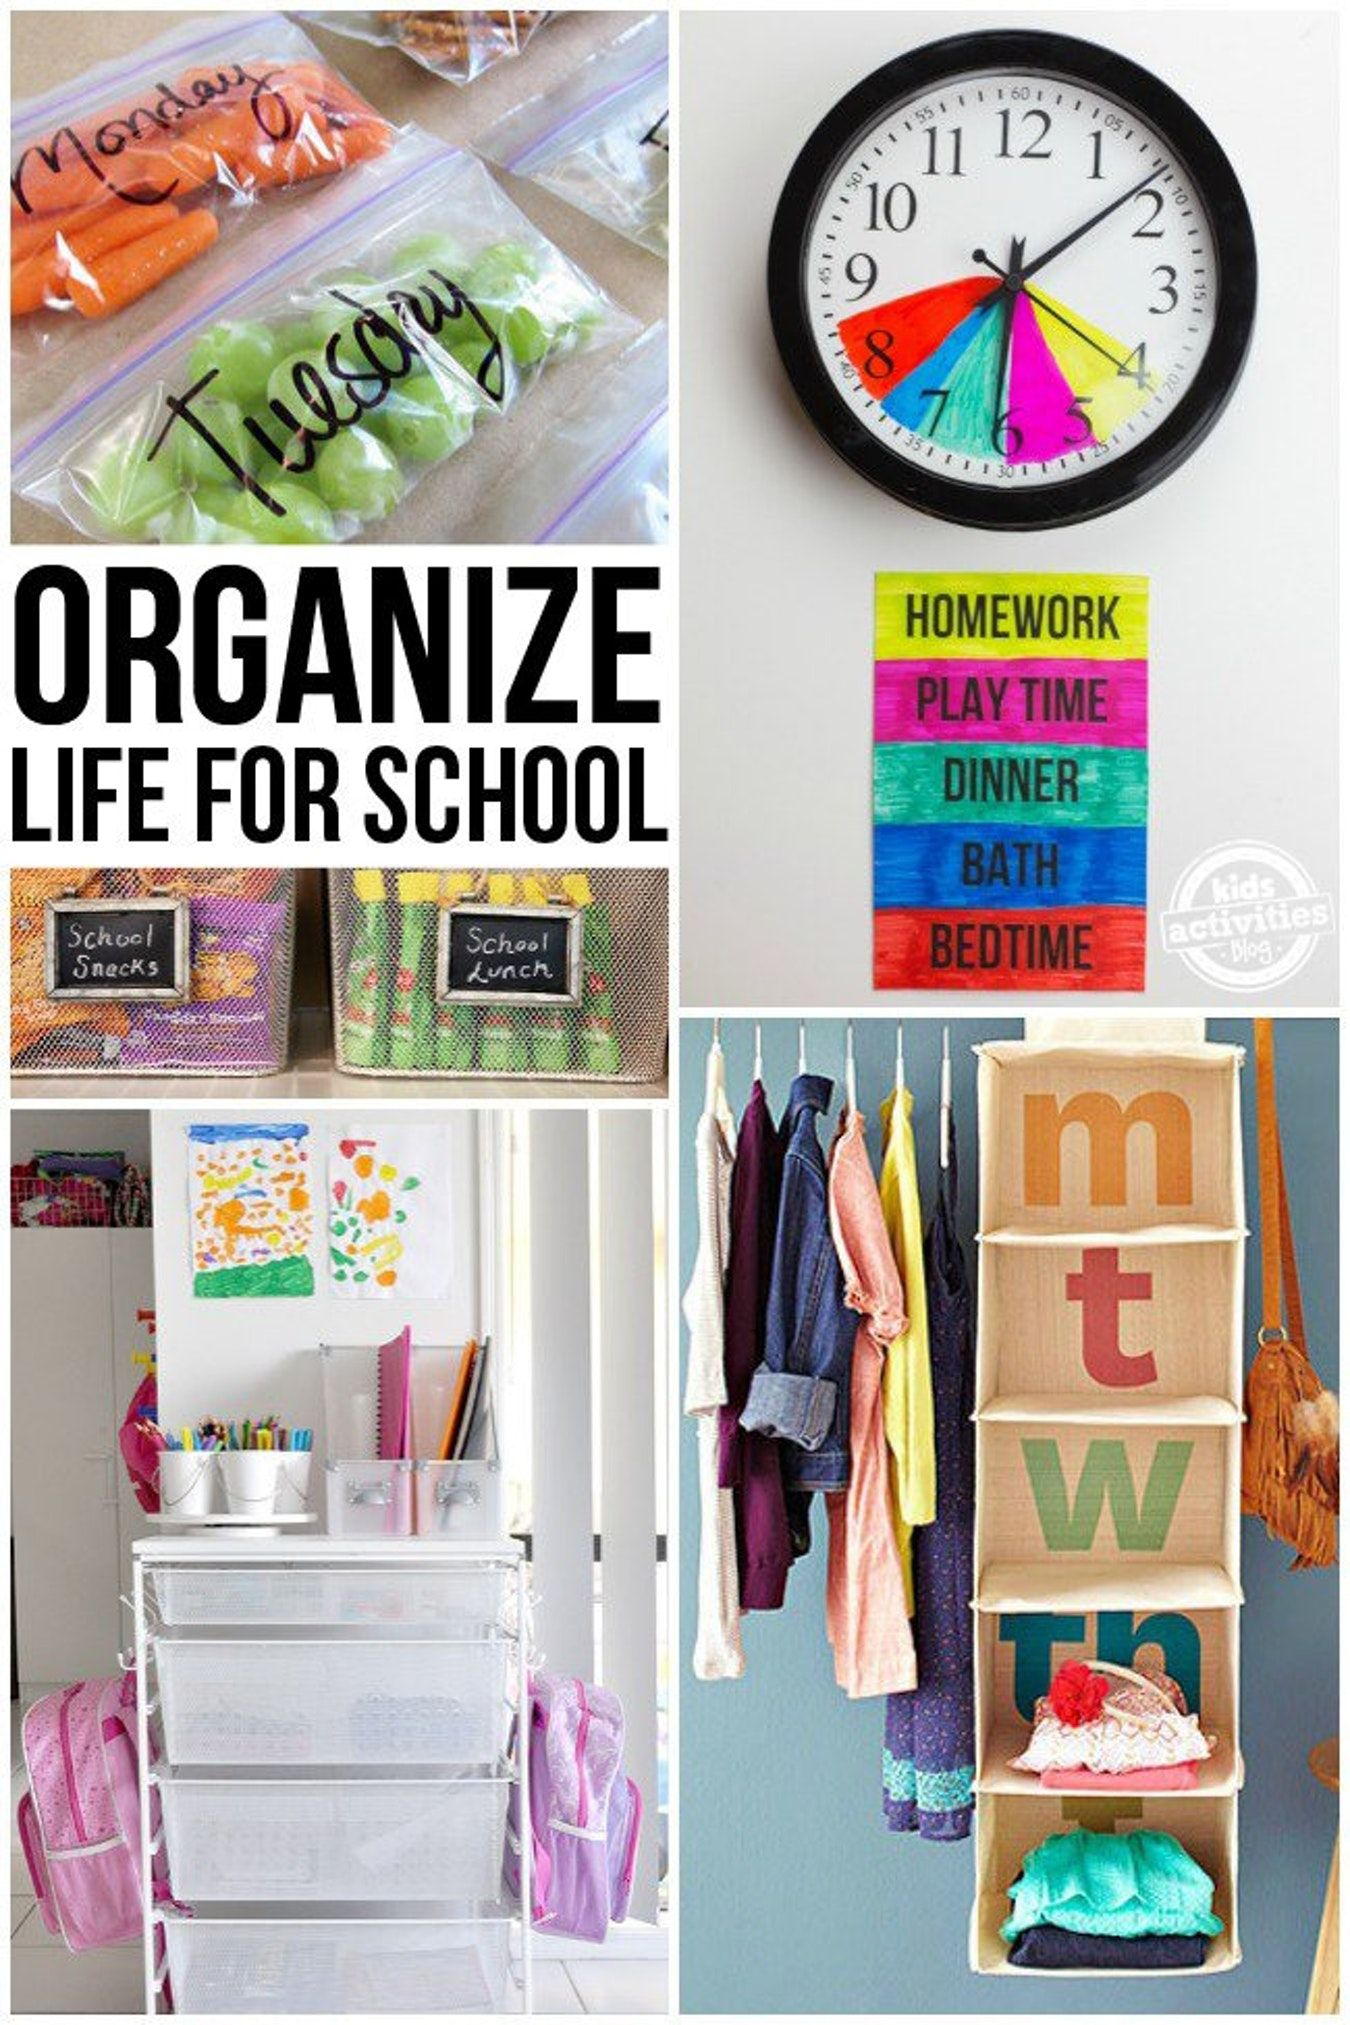 Organizing Life for School Kids Activities Life hacks